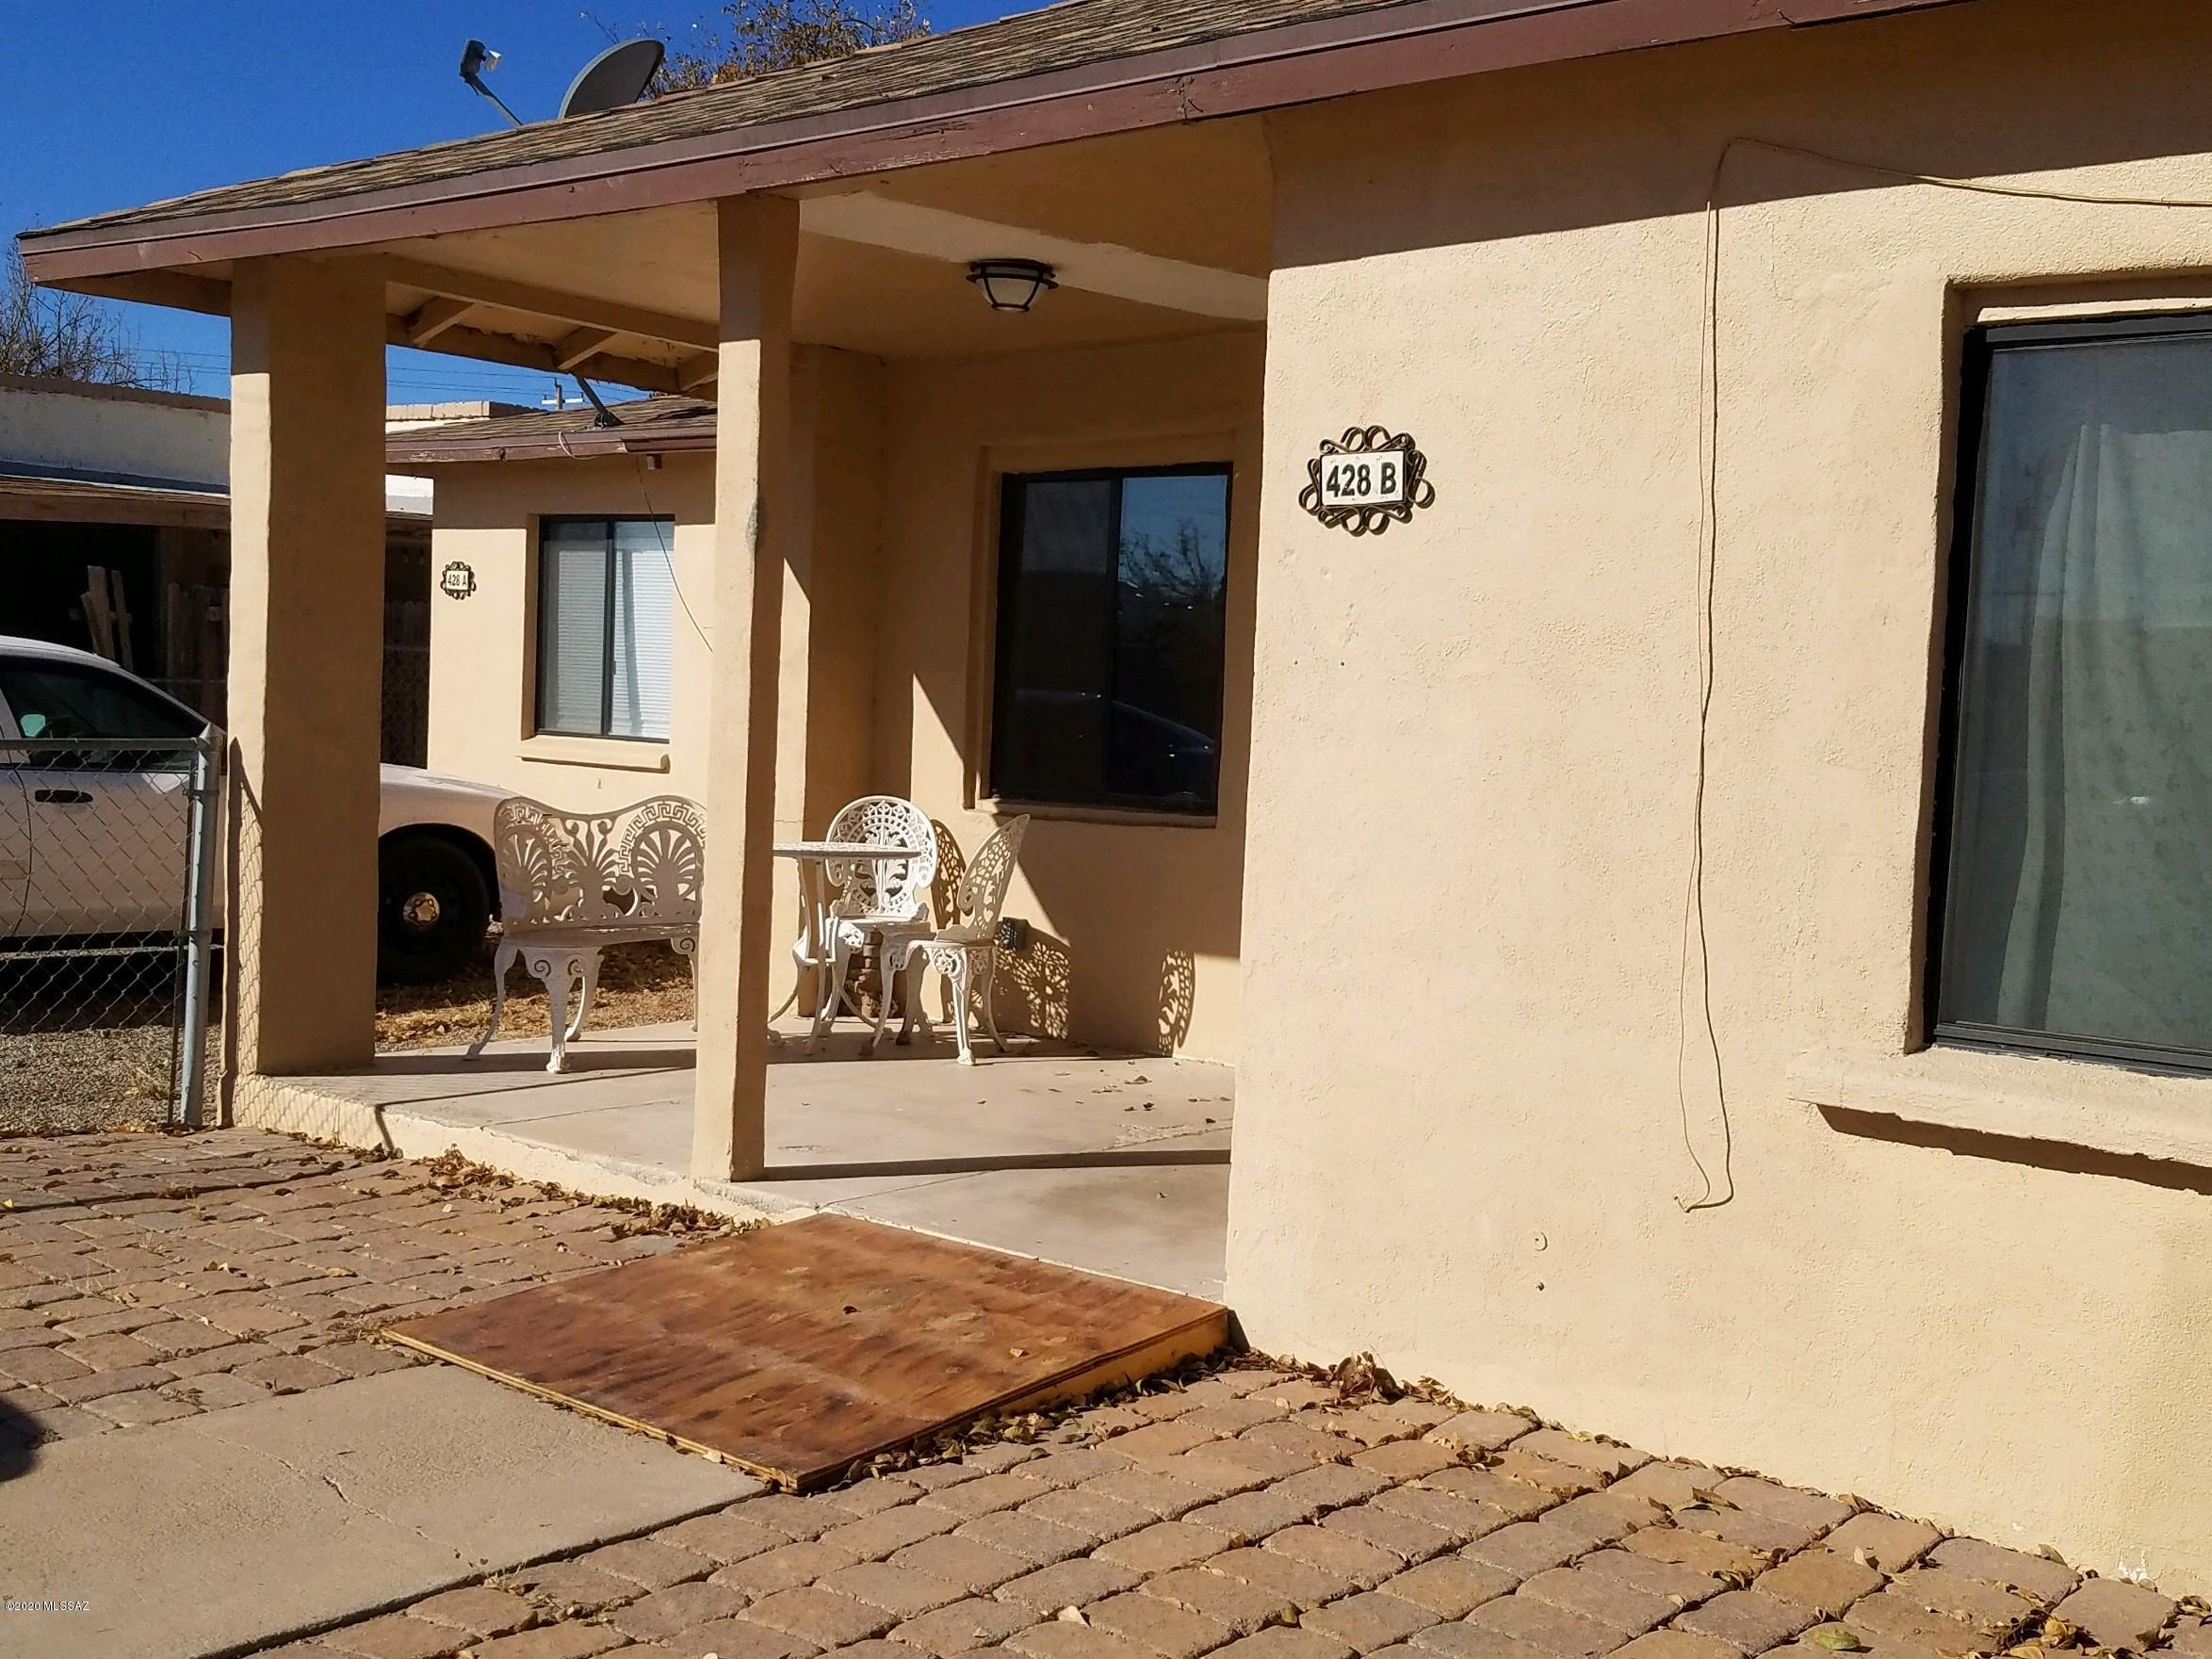 428 N Curtis Avenue, Willcox, Arizona 85643, ,Multifamily,For Sale,428 N Curtis Avenue,22004704